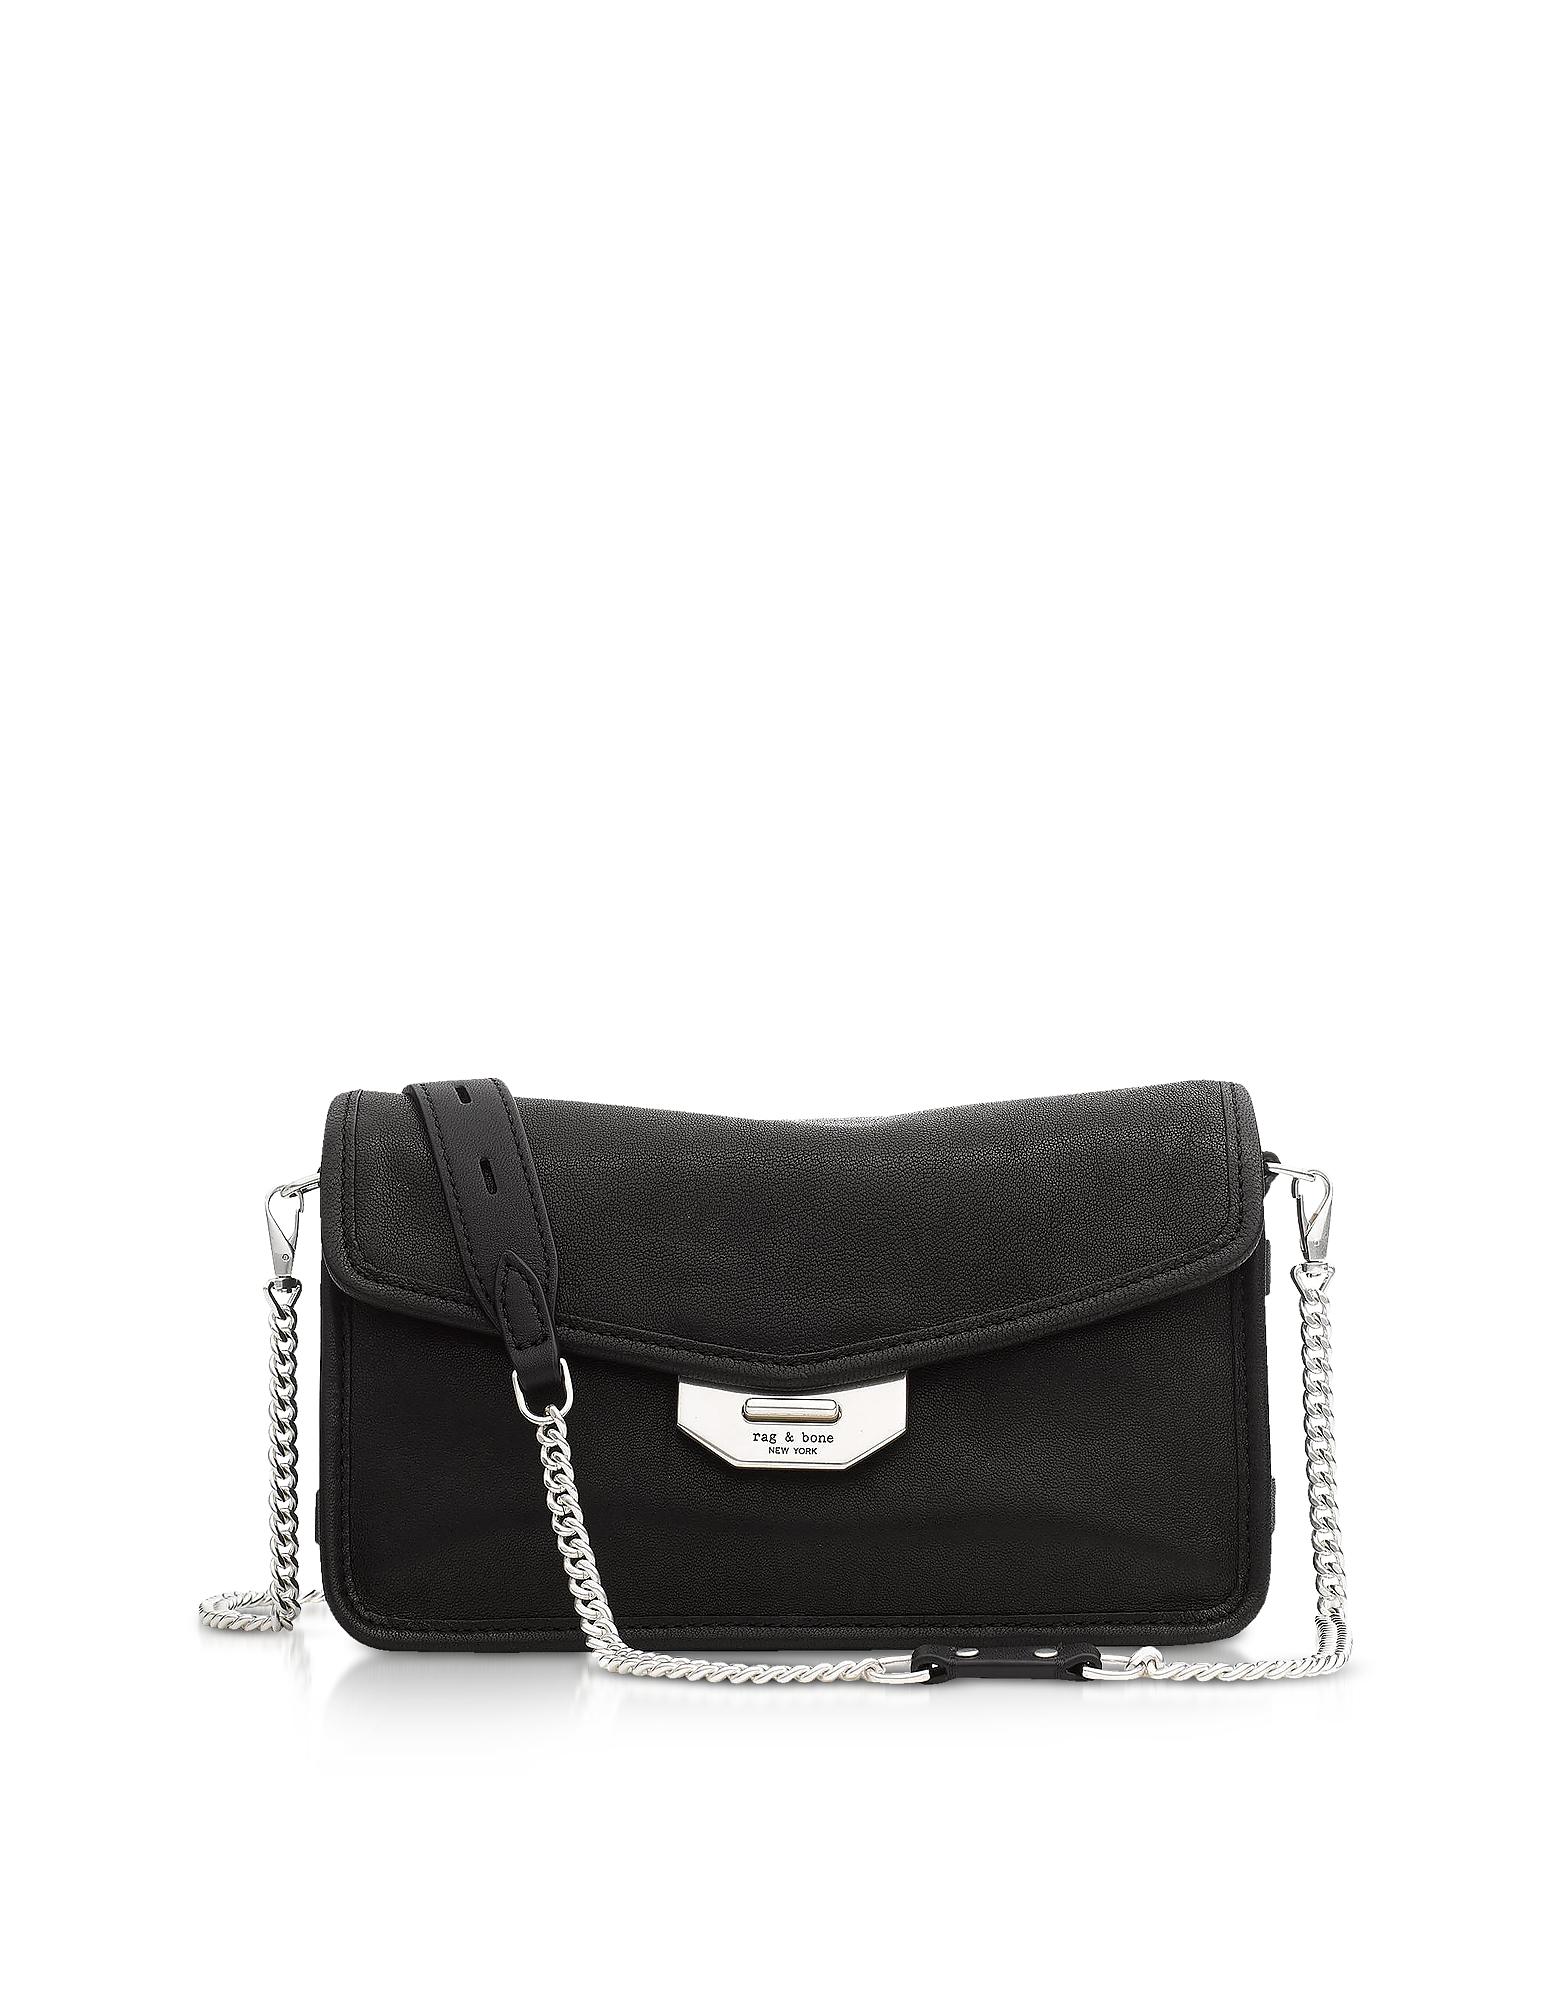 Image of Rag & Bone Designer Handbags, Black Leather Field Clutch